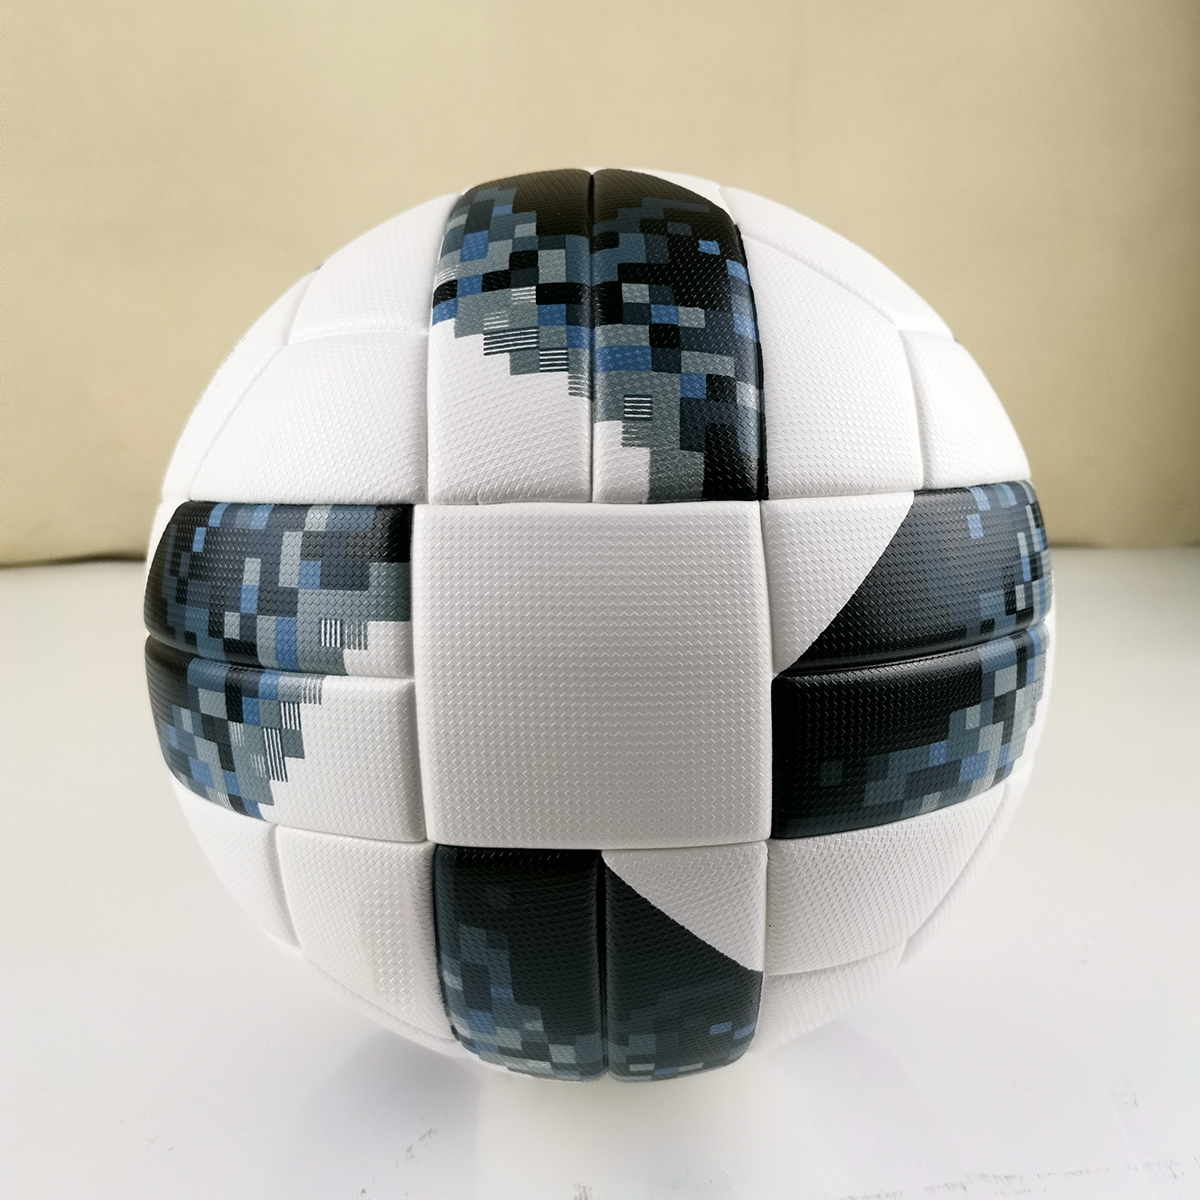 Oficial tamaño 5 balón de fútbol PU gránulo antideslizante fútbol sin costuras bolas de regalo Goal Team Match fútbol entrenamiento pelotas